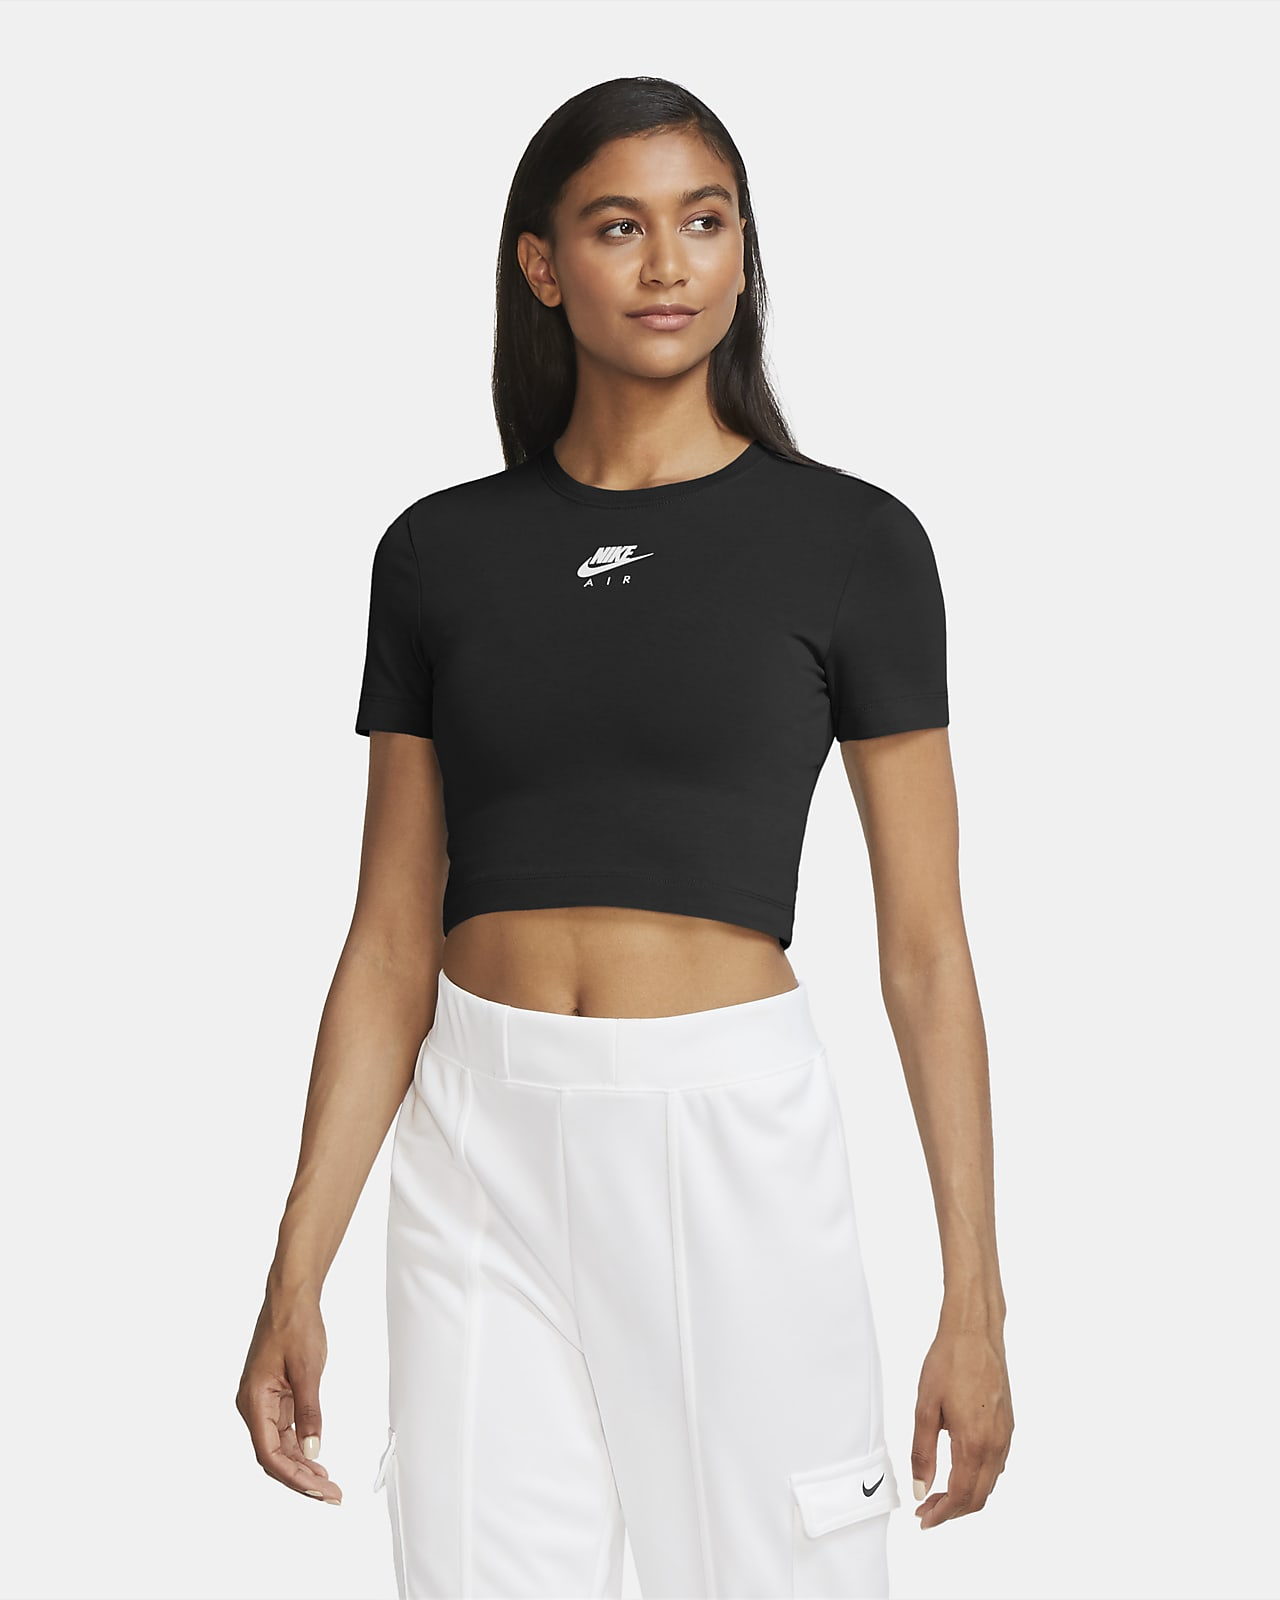 Nike Air Kısa Kadın Üstü